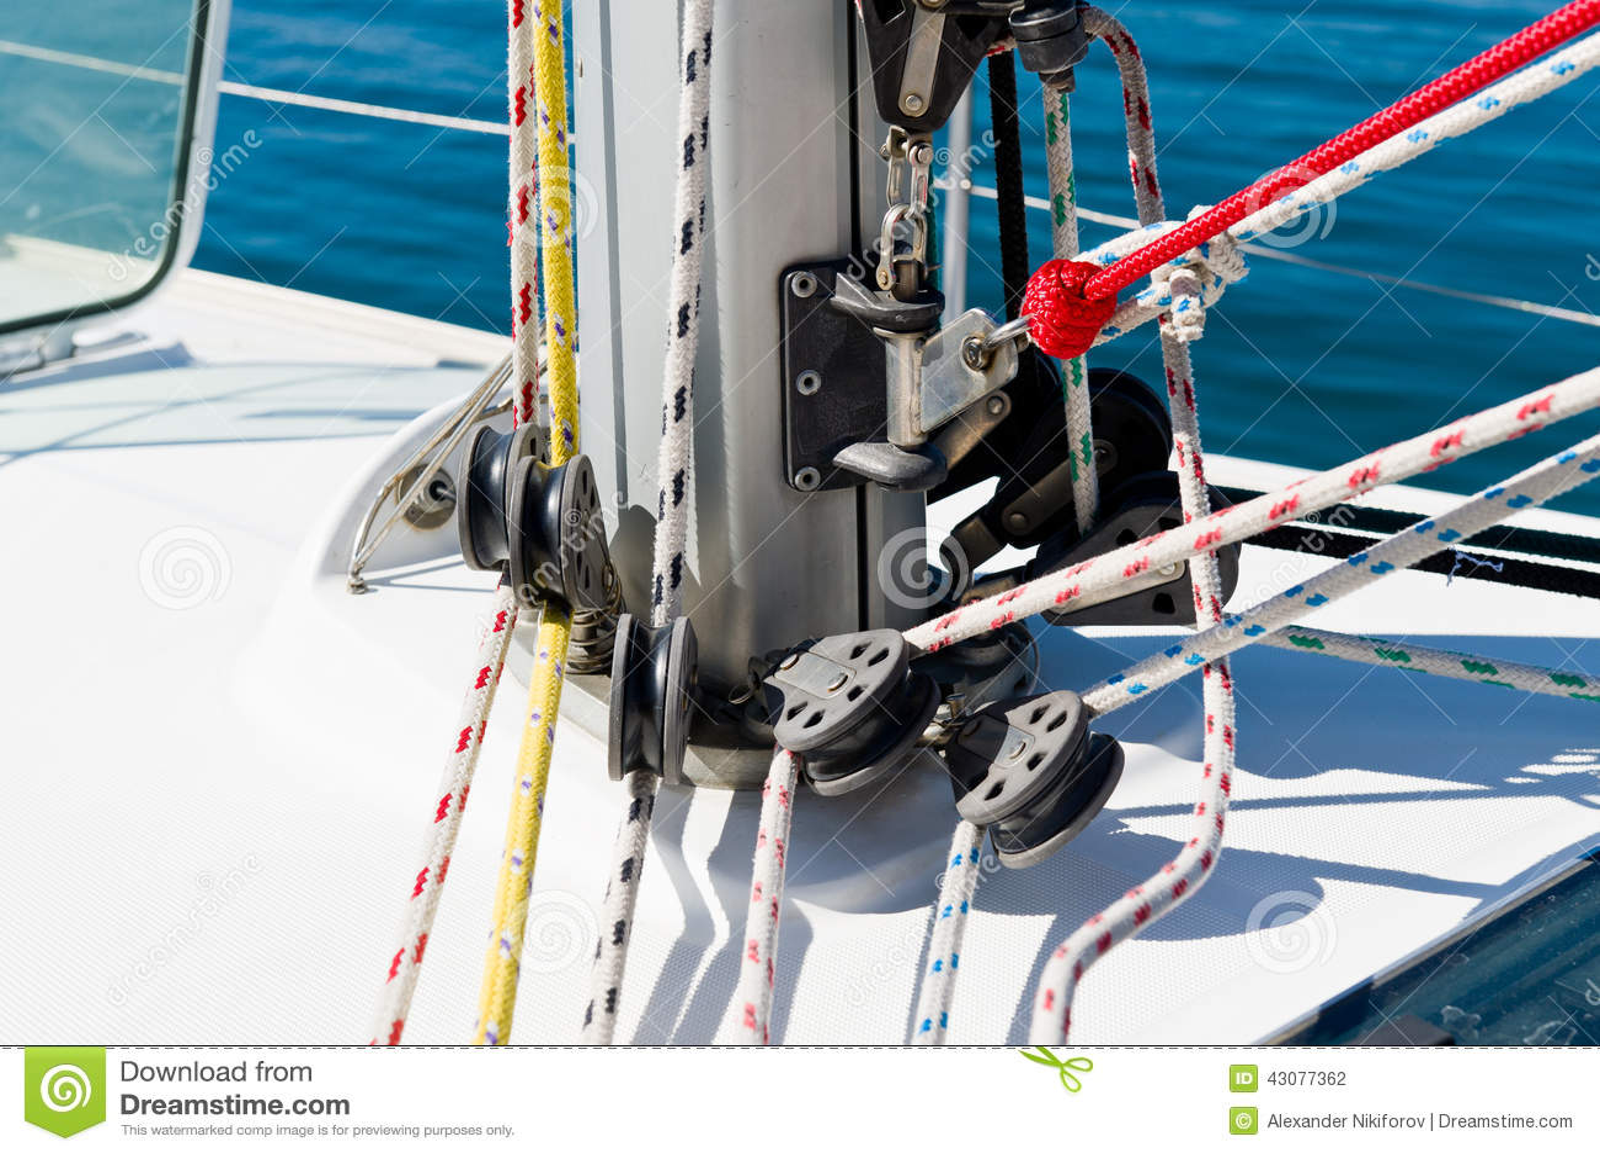 Sailing boat mast stock photo  Image of cord, maritime - 43077362